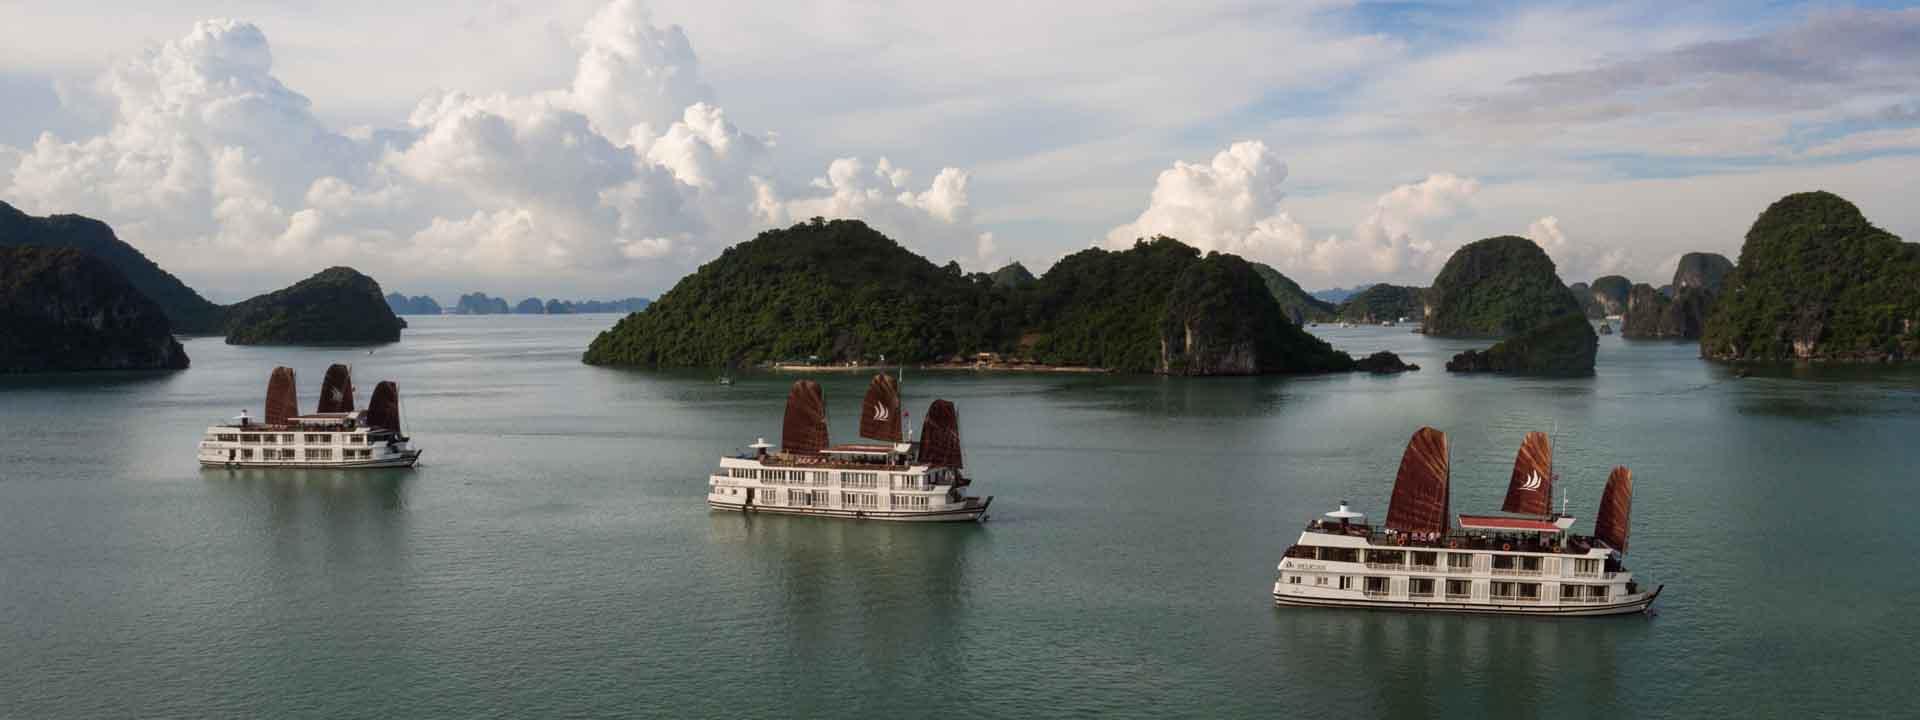 Bai Tho Victory Star Cruise 3 days